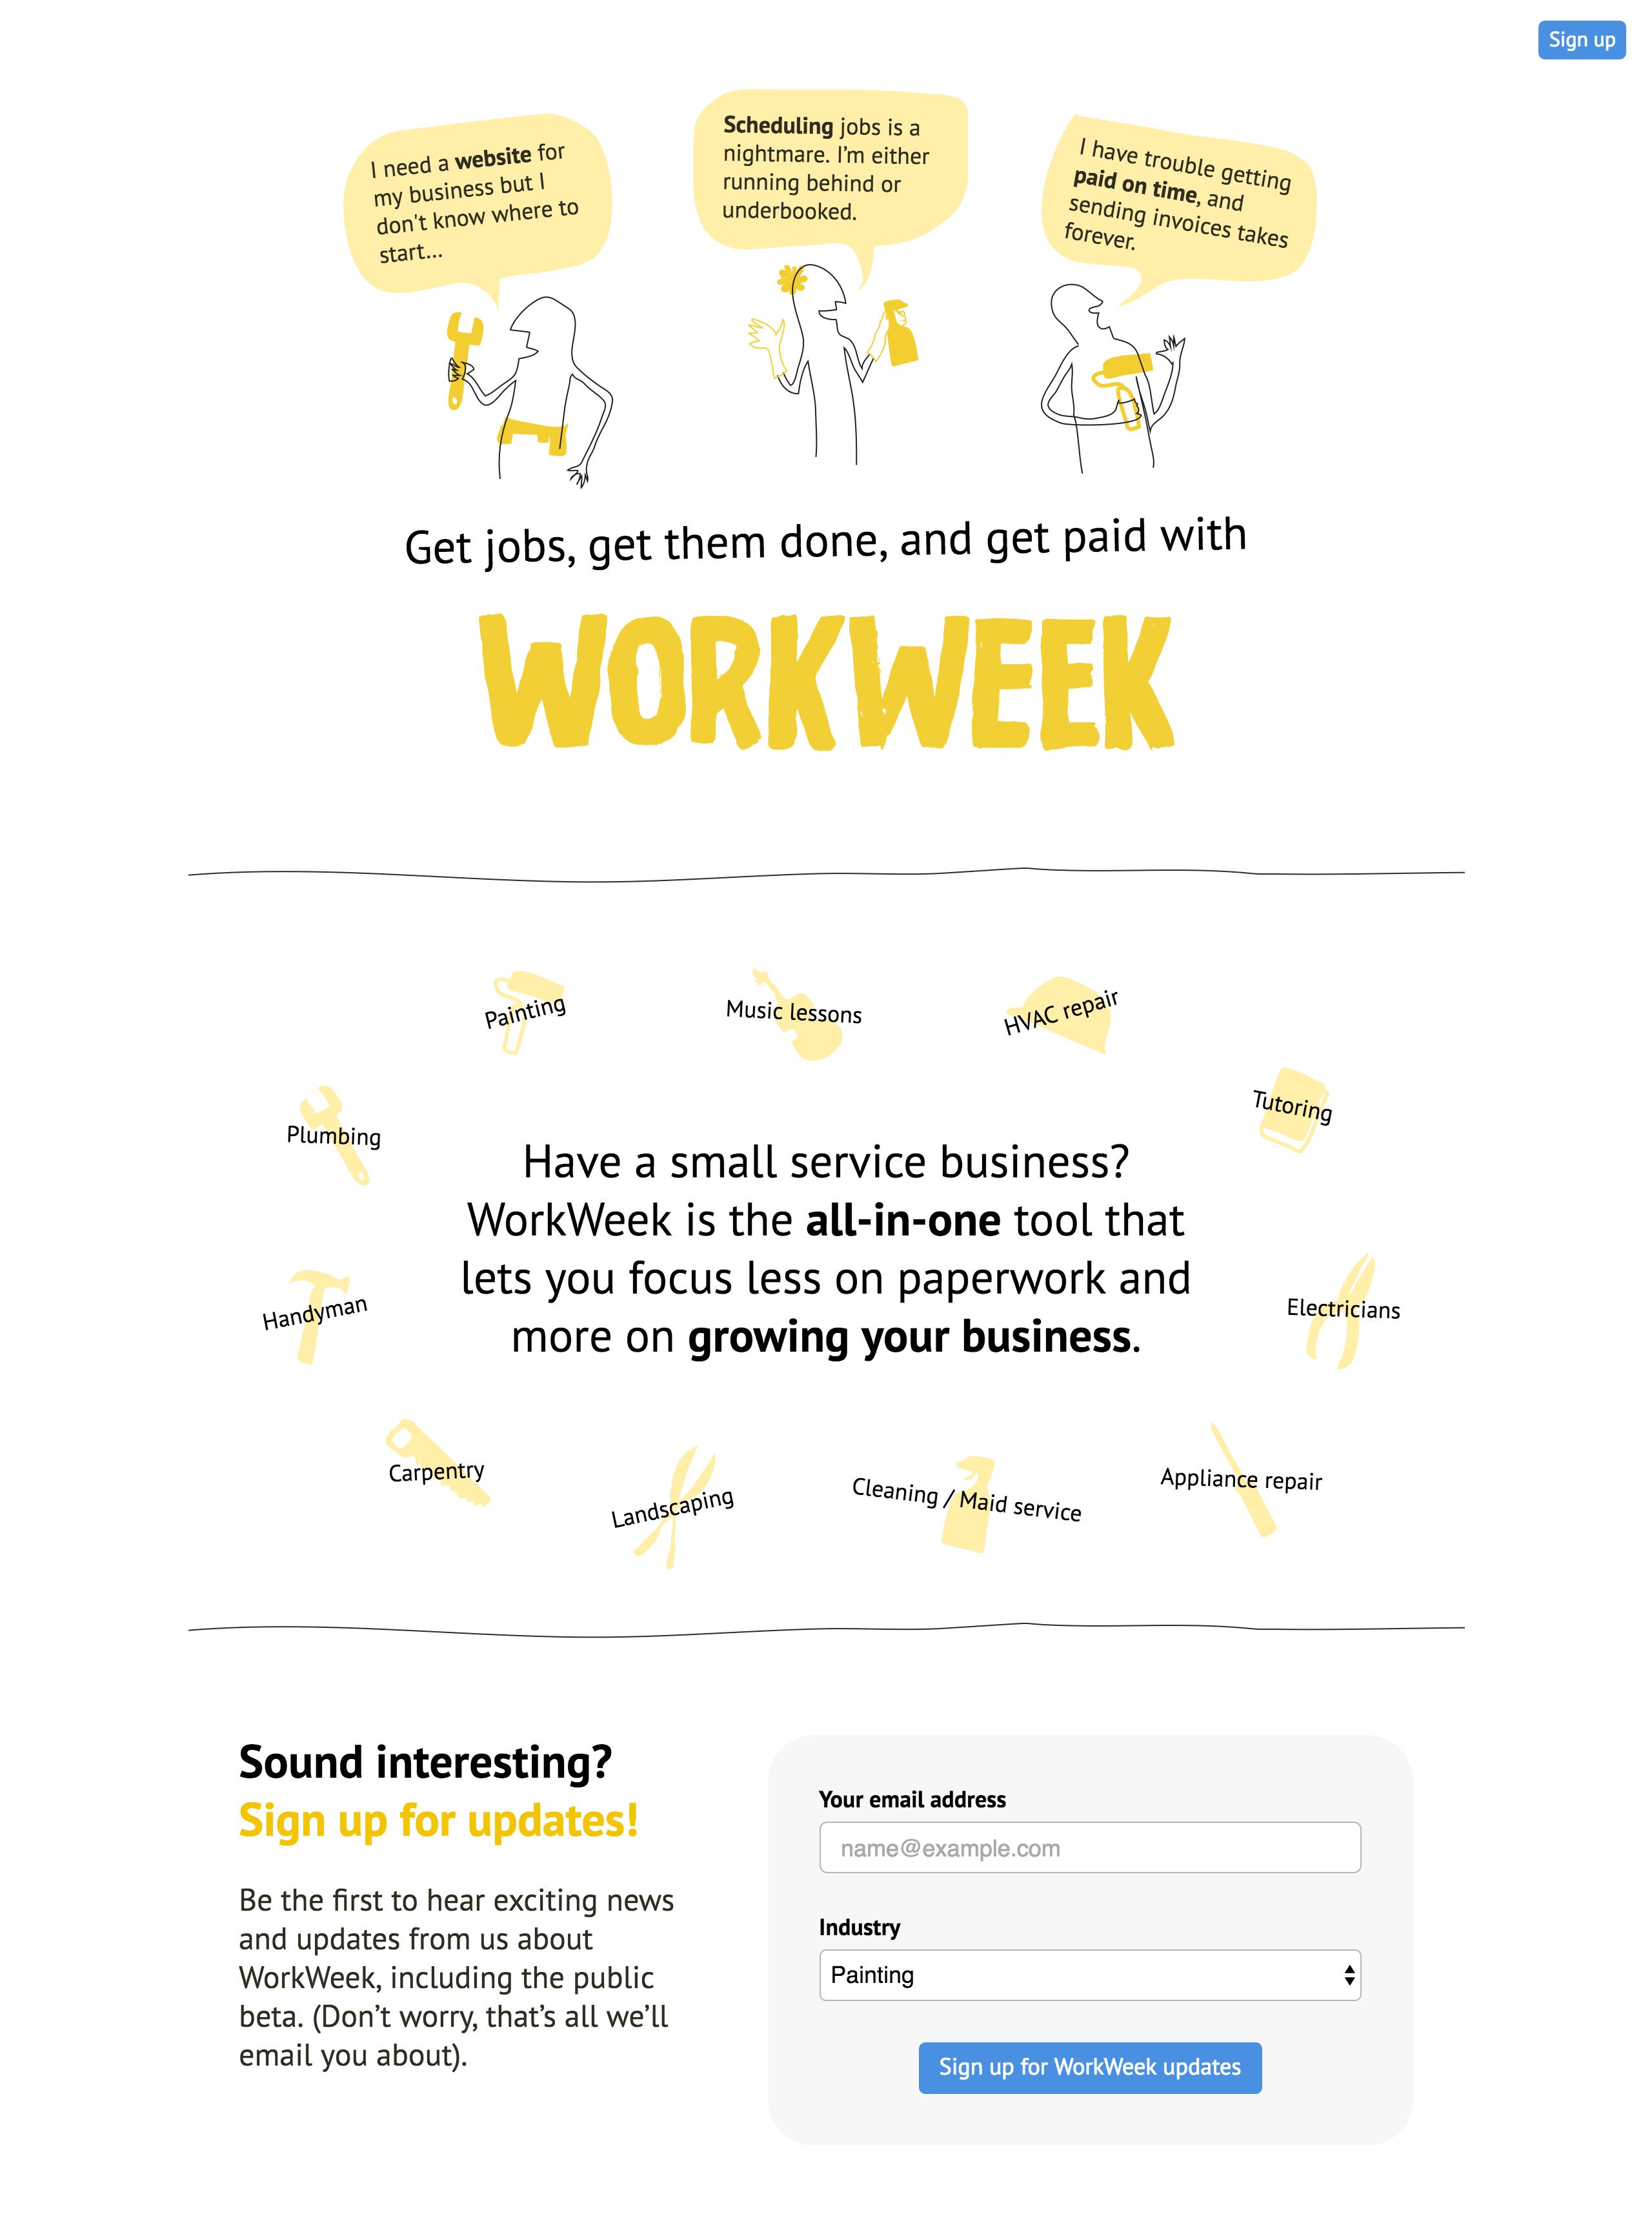 WorkWeek Big Screenshot